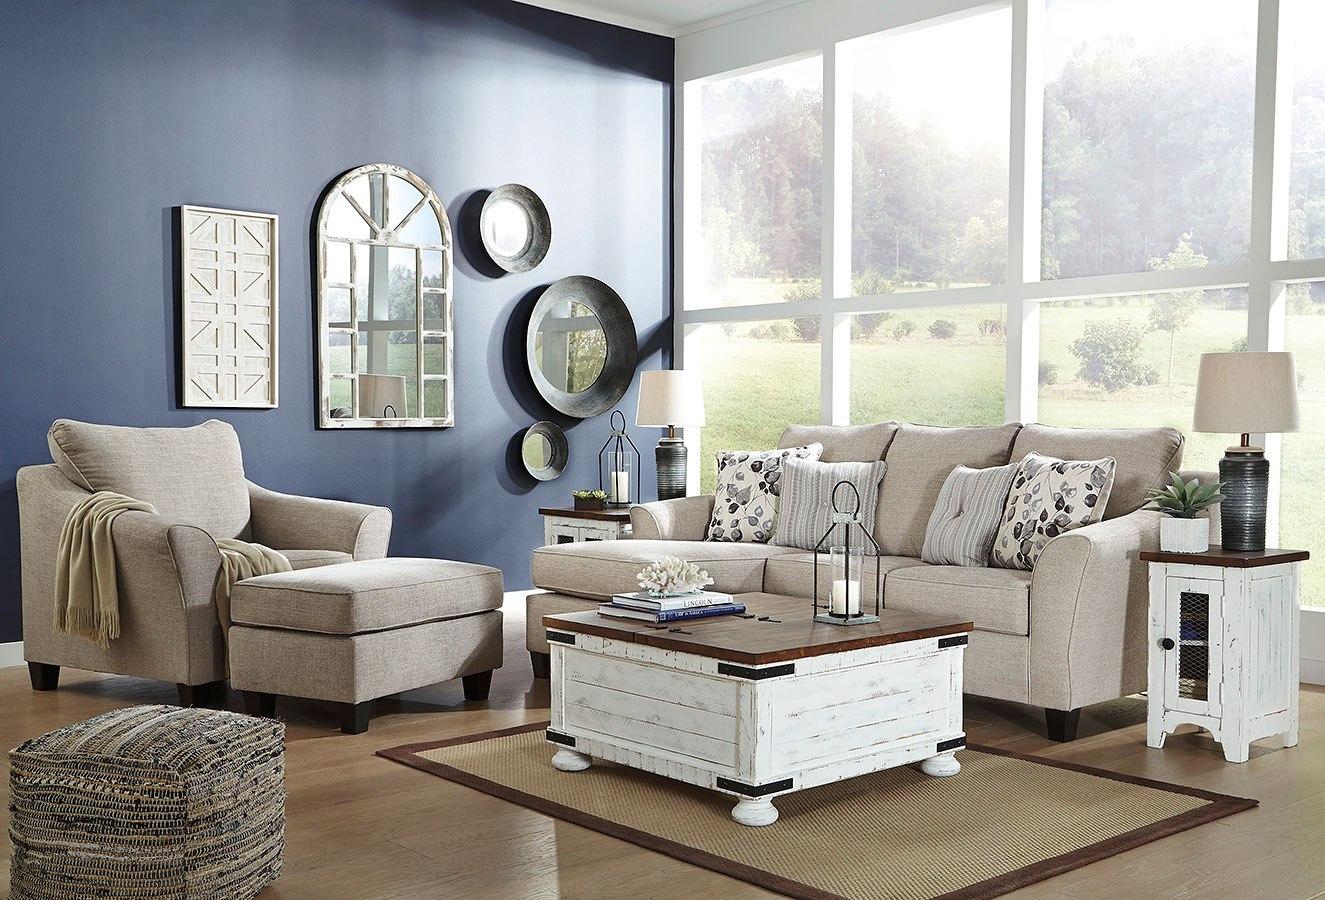 Abney Driftwood Living Room Set Signature Design By Ashley